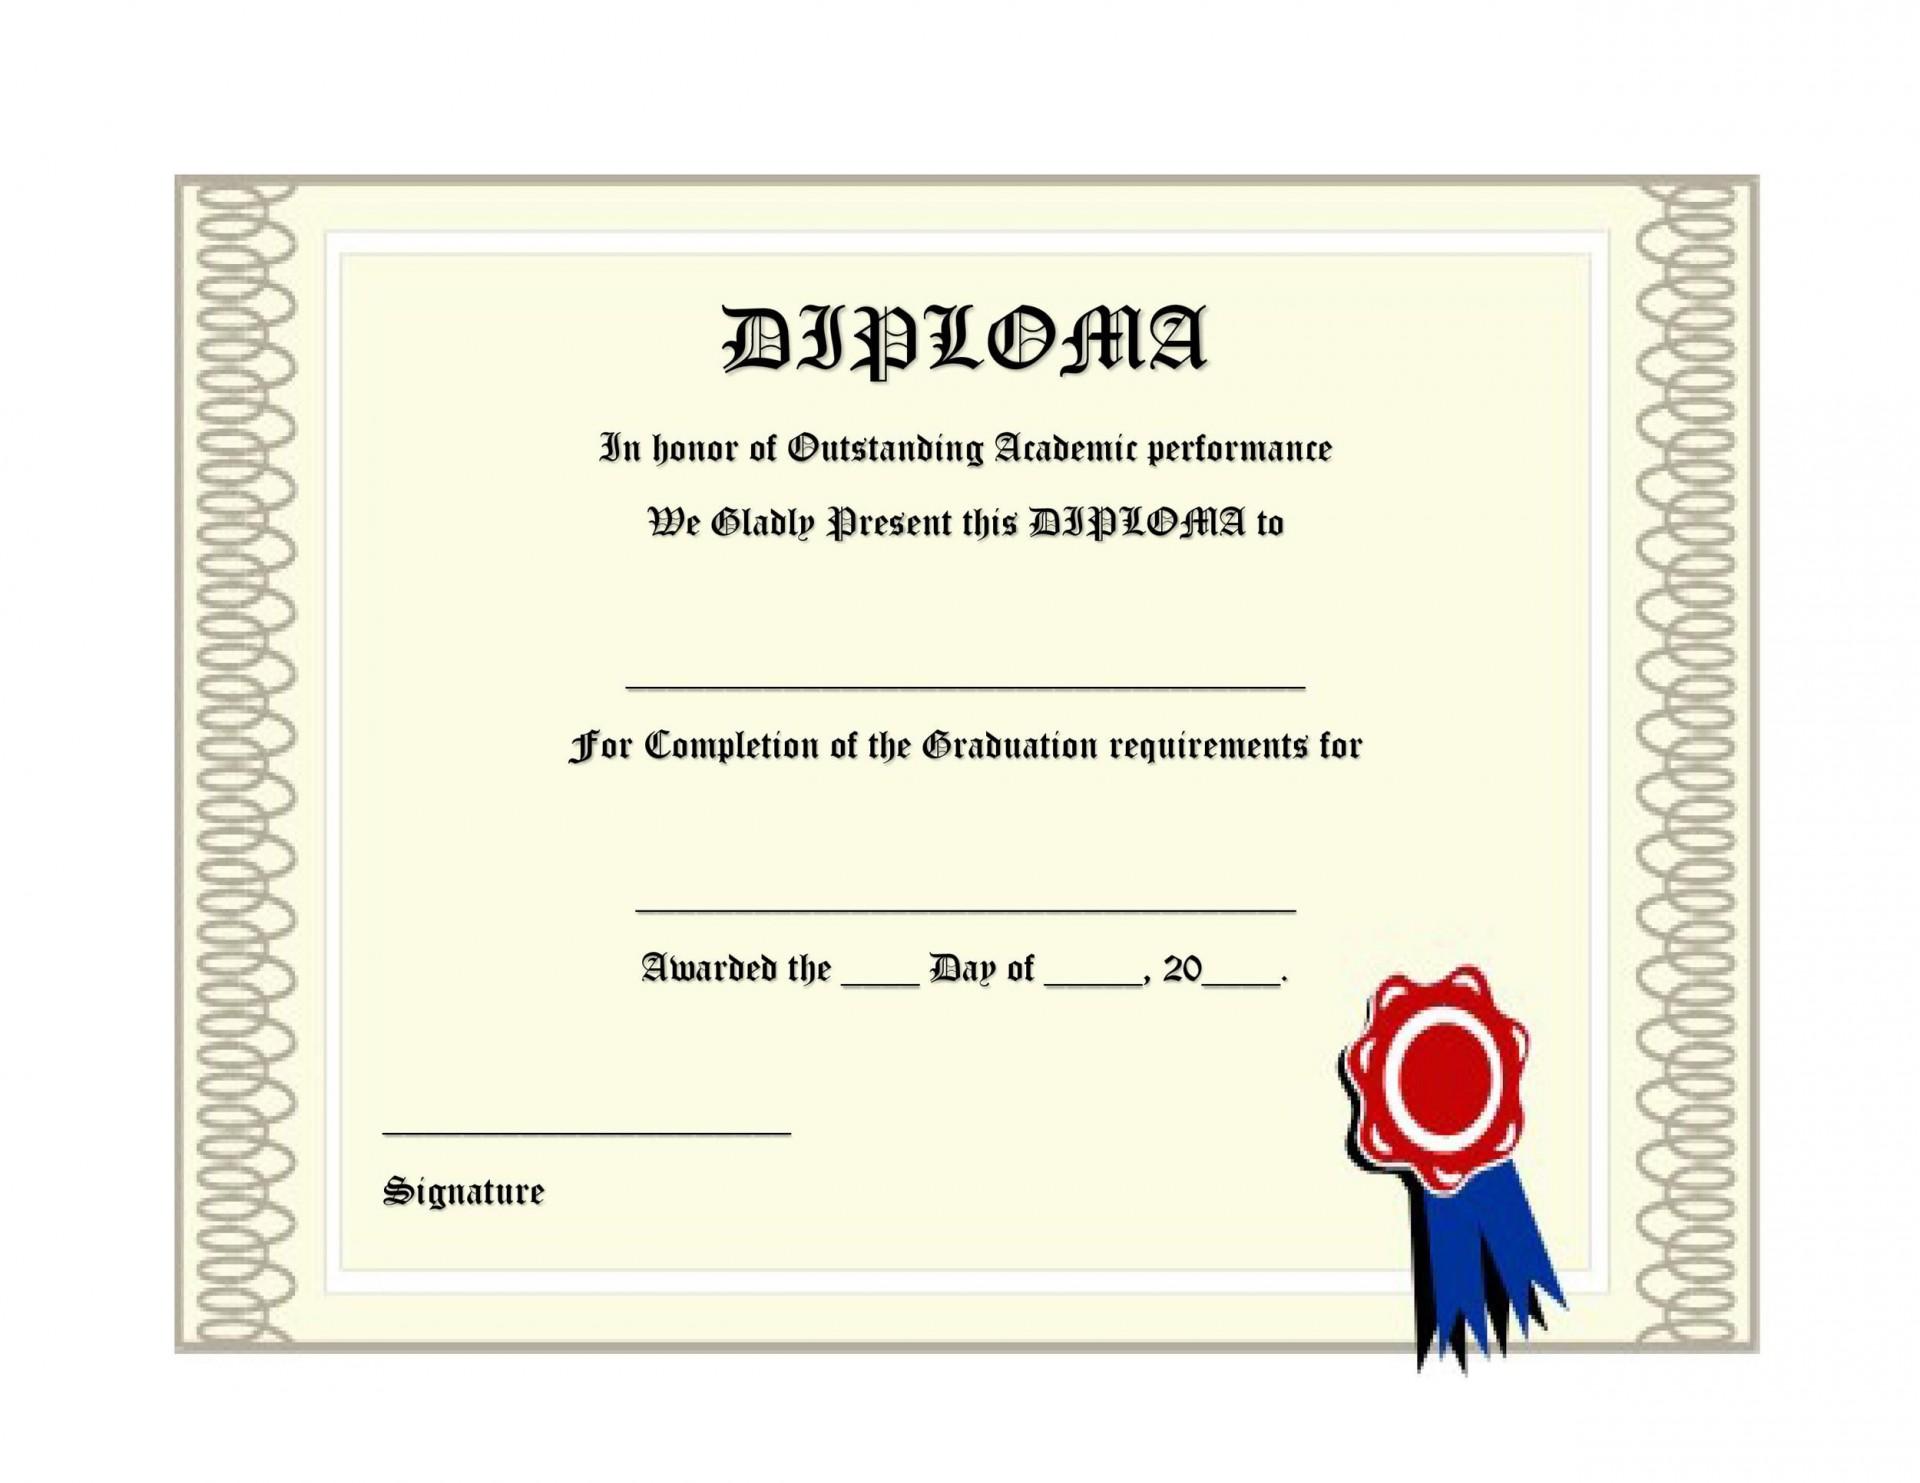 008 Phenomenal High School Diploma Template Def  With Seal Homeschool Free Printable Blank1920